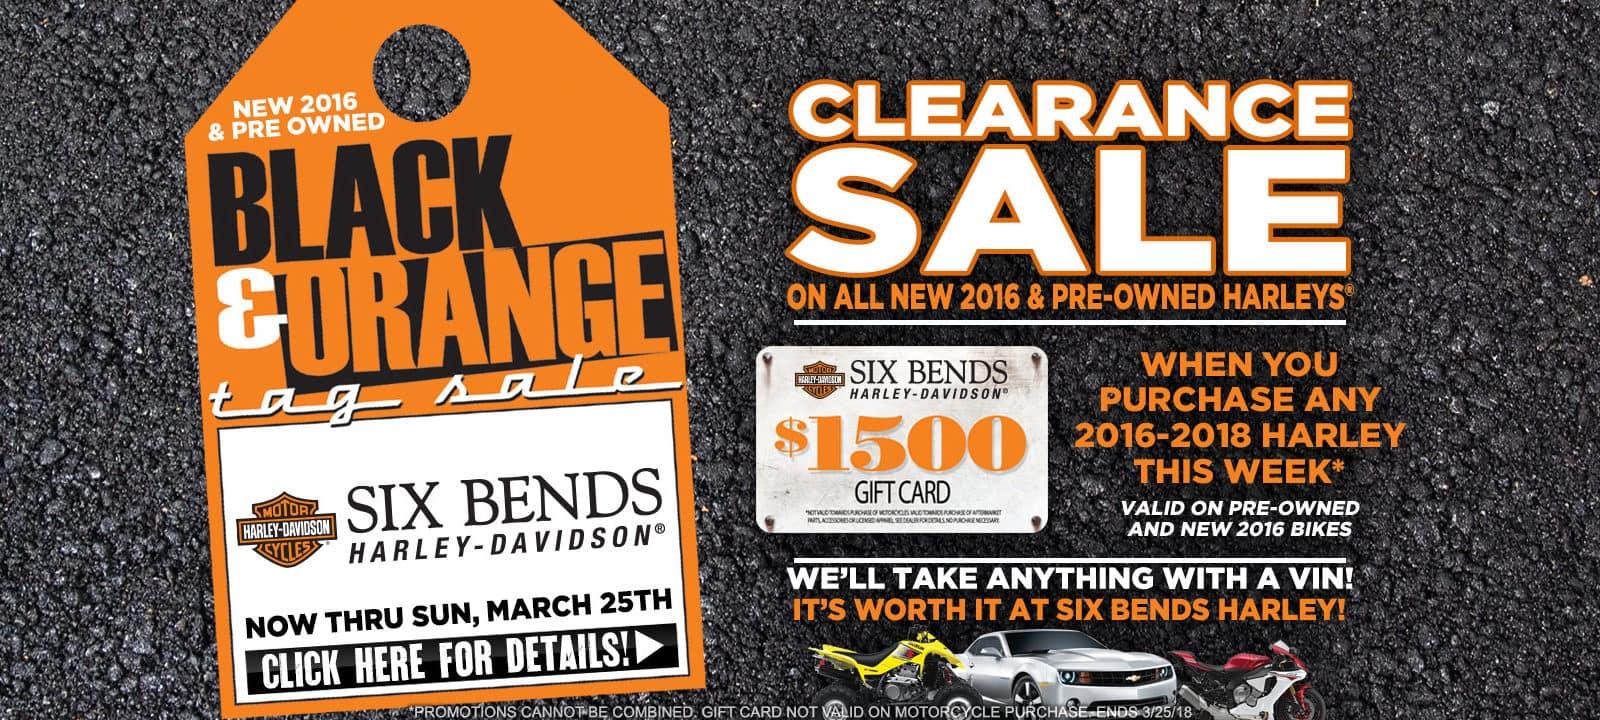 20180319-1800x720-SBHD-Black-&-Orange-Tag-Sale-1500-Gift-Card